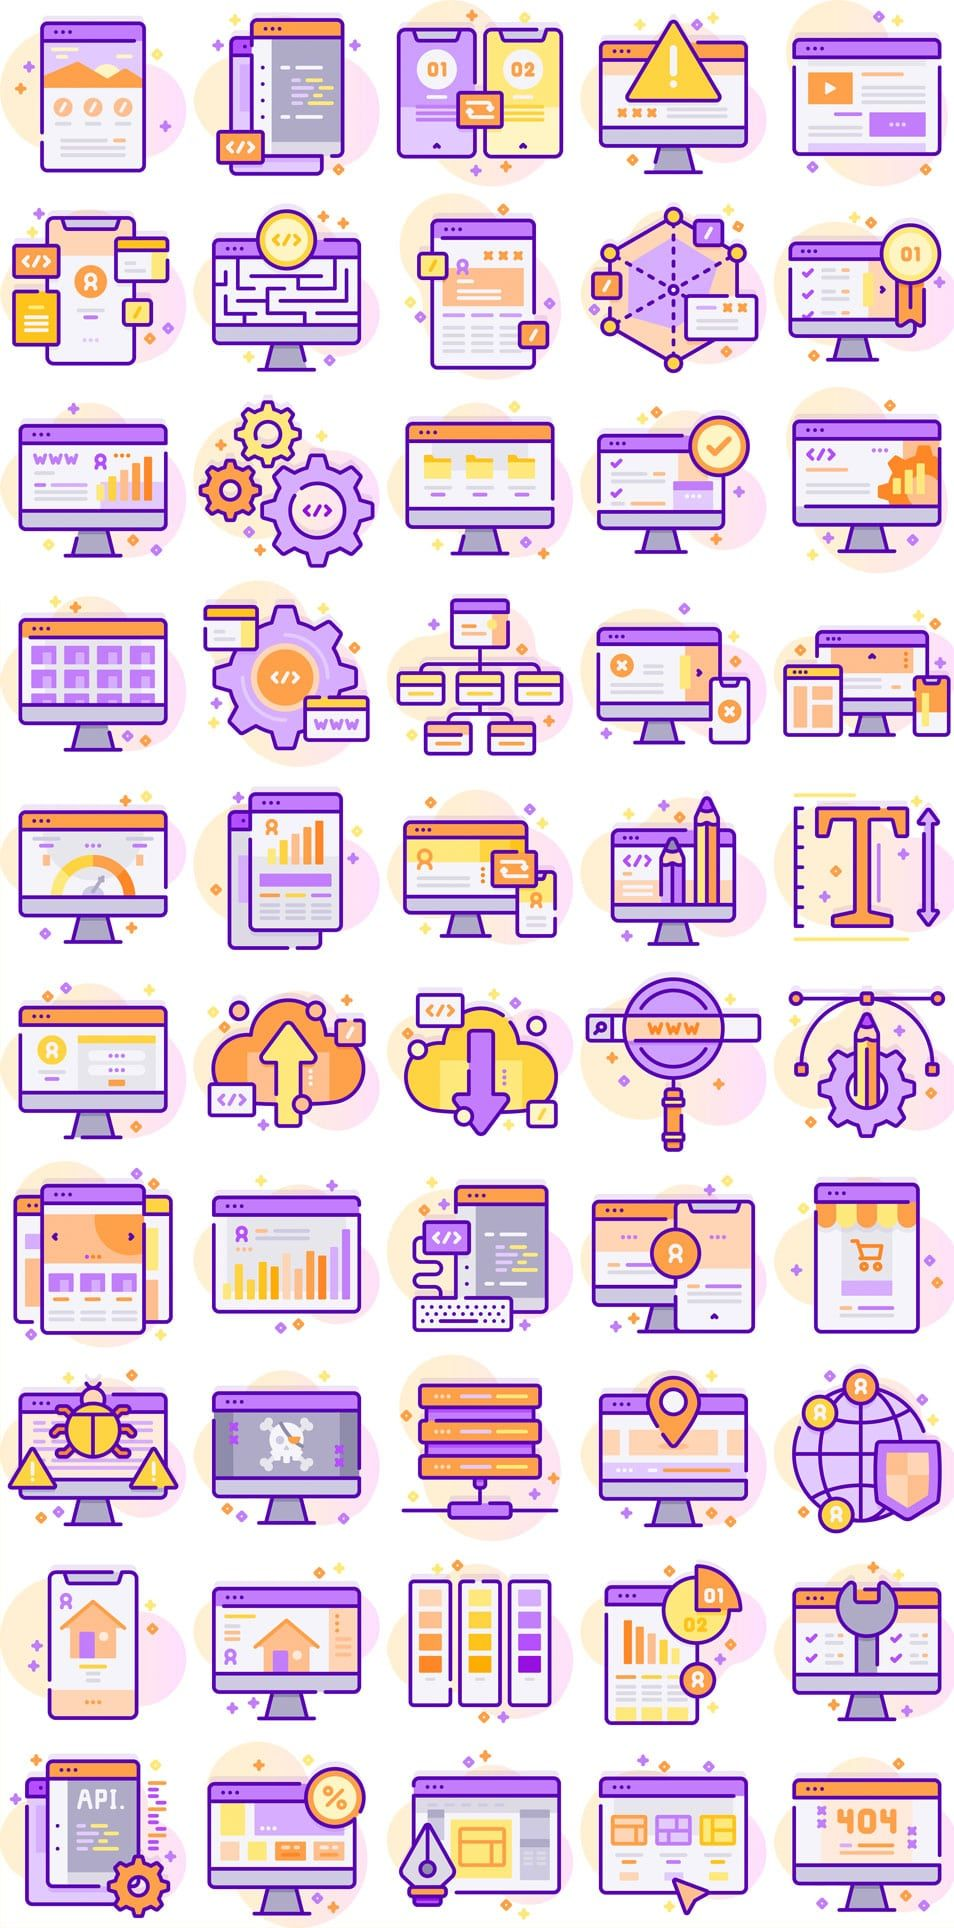 Web Development Iconset (SVG,PNG Programme, Graphisme